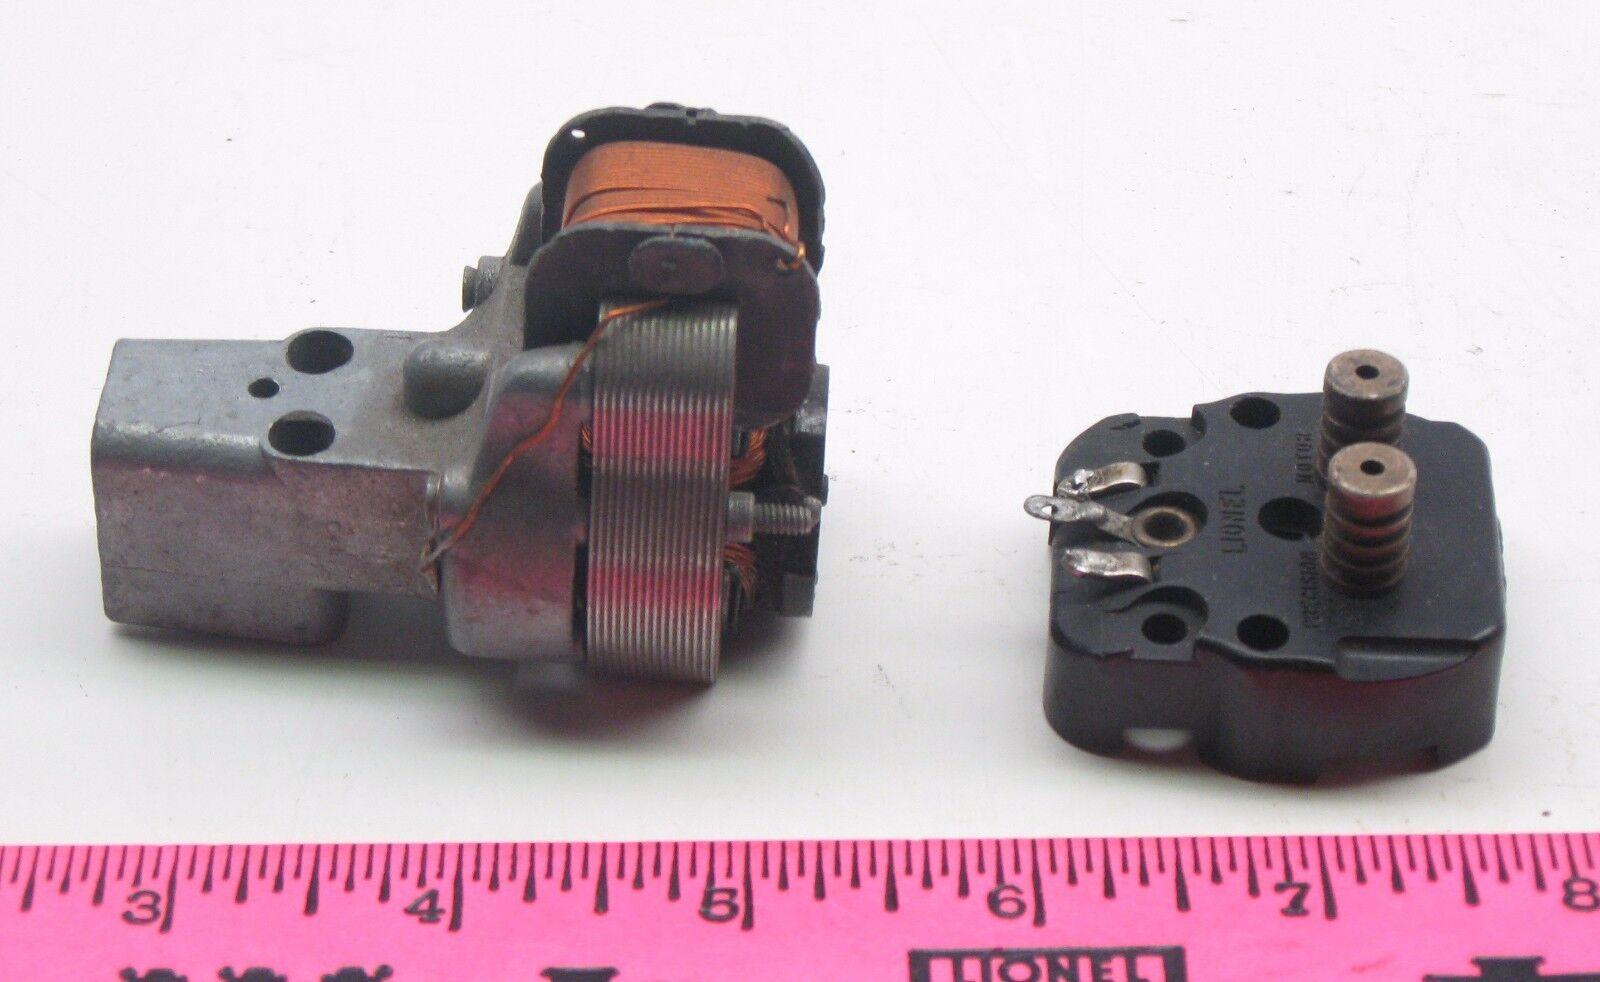 Lionel  power motor  parts